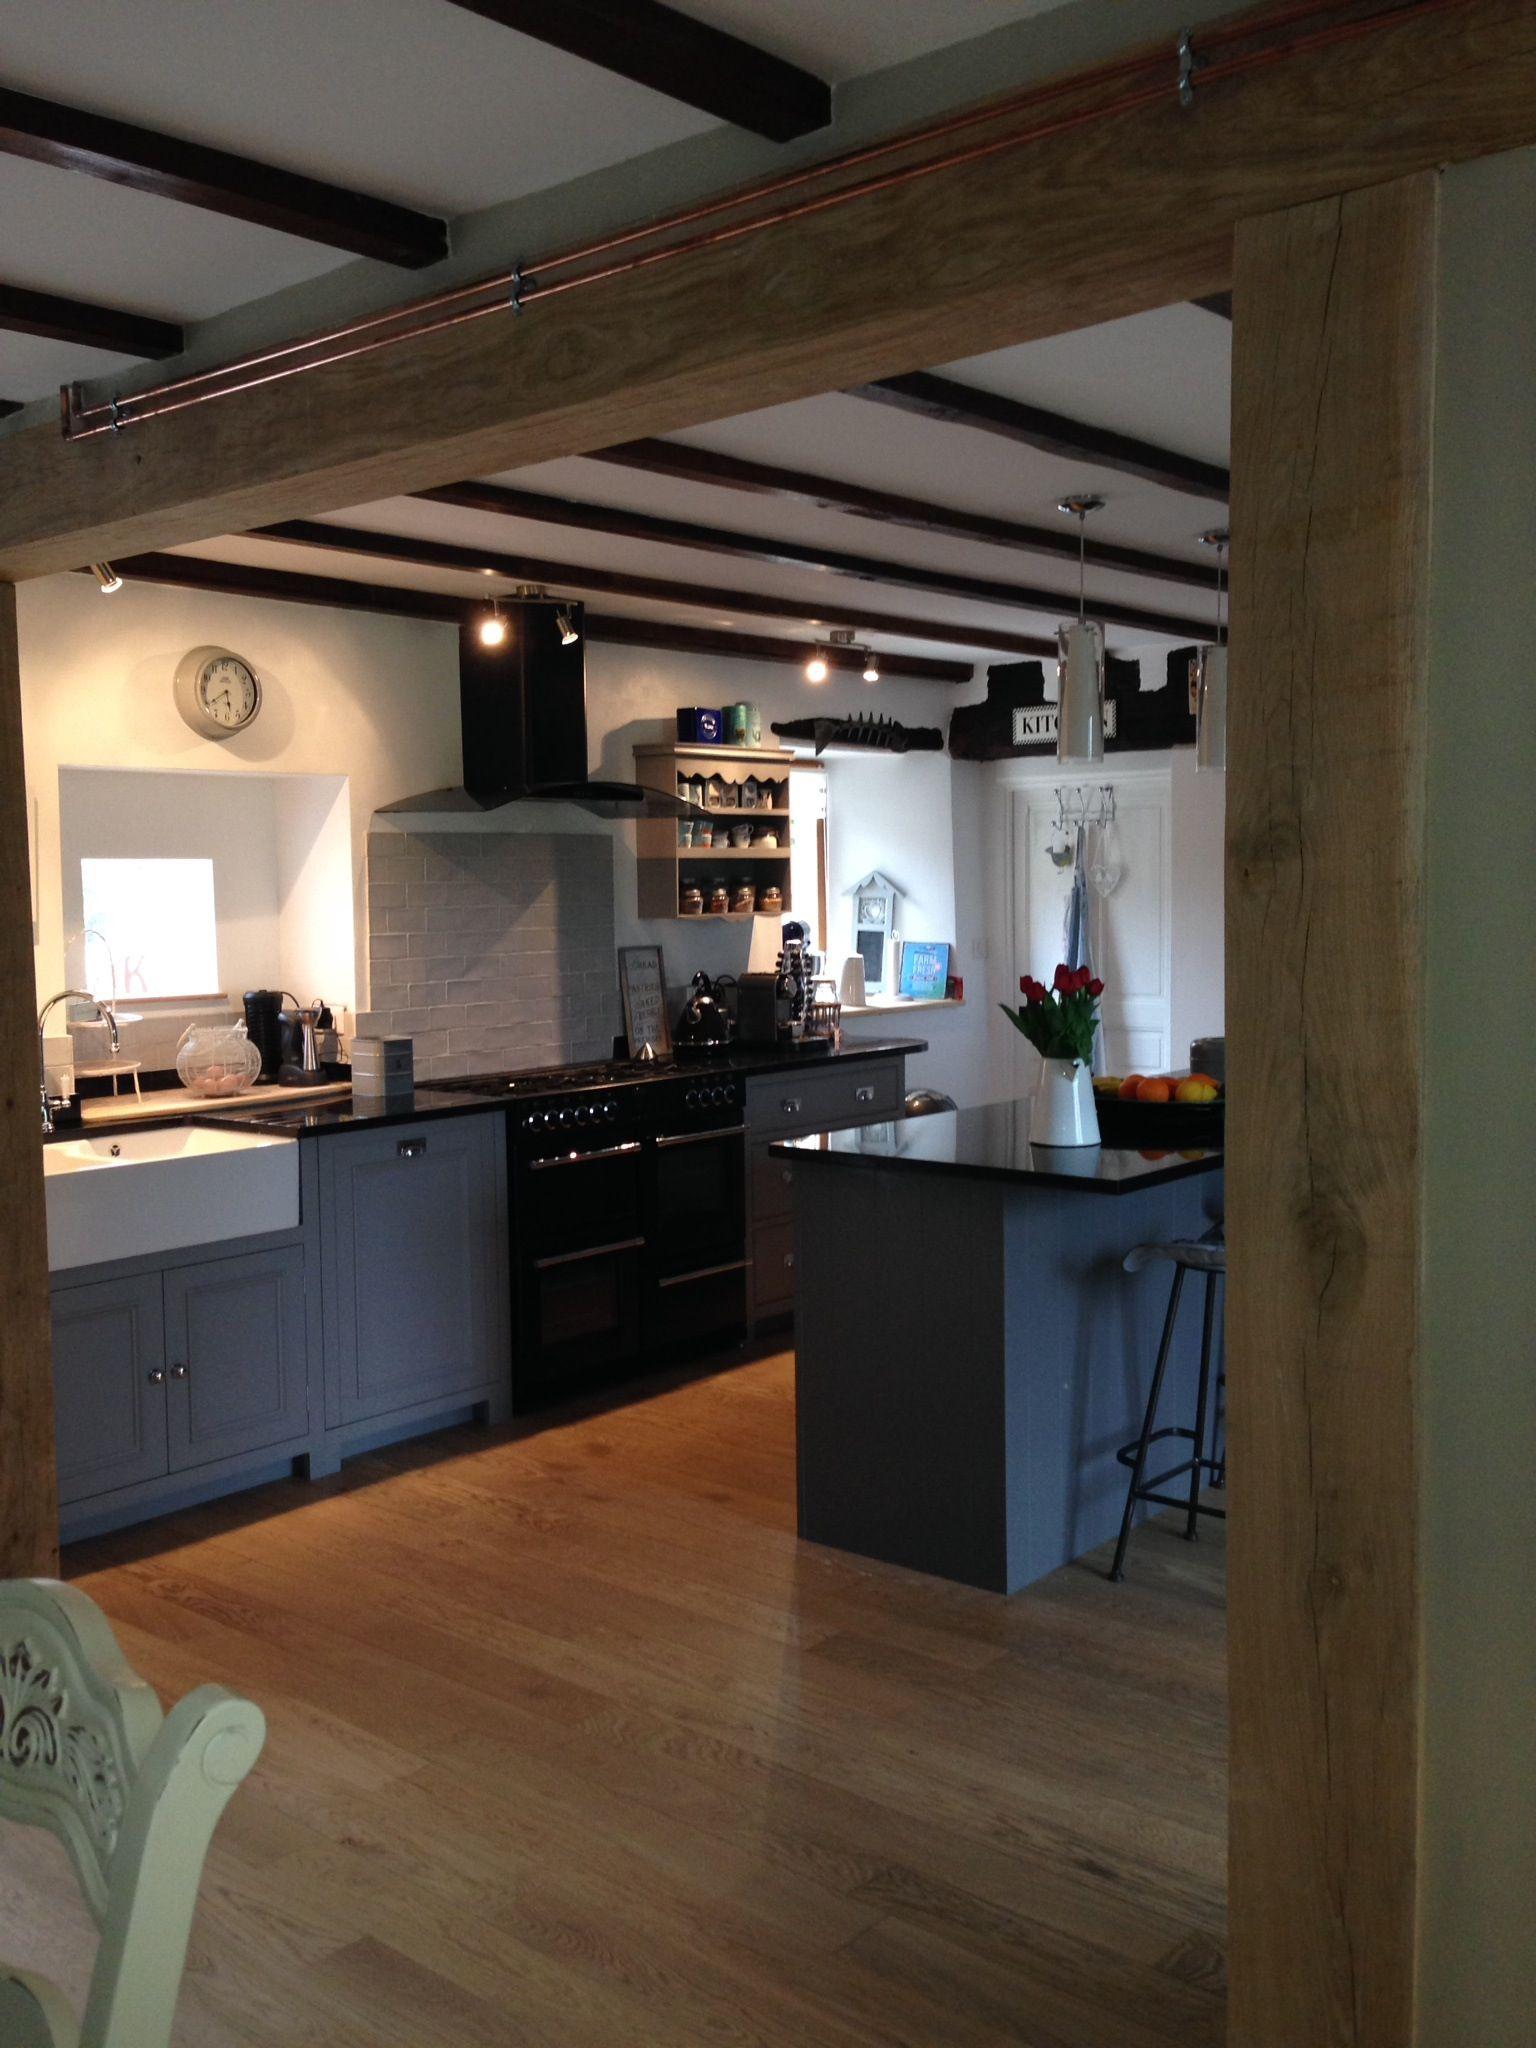 Neptune Chichester kitchen in cobble and shale | Neptune ...